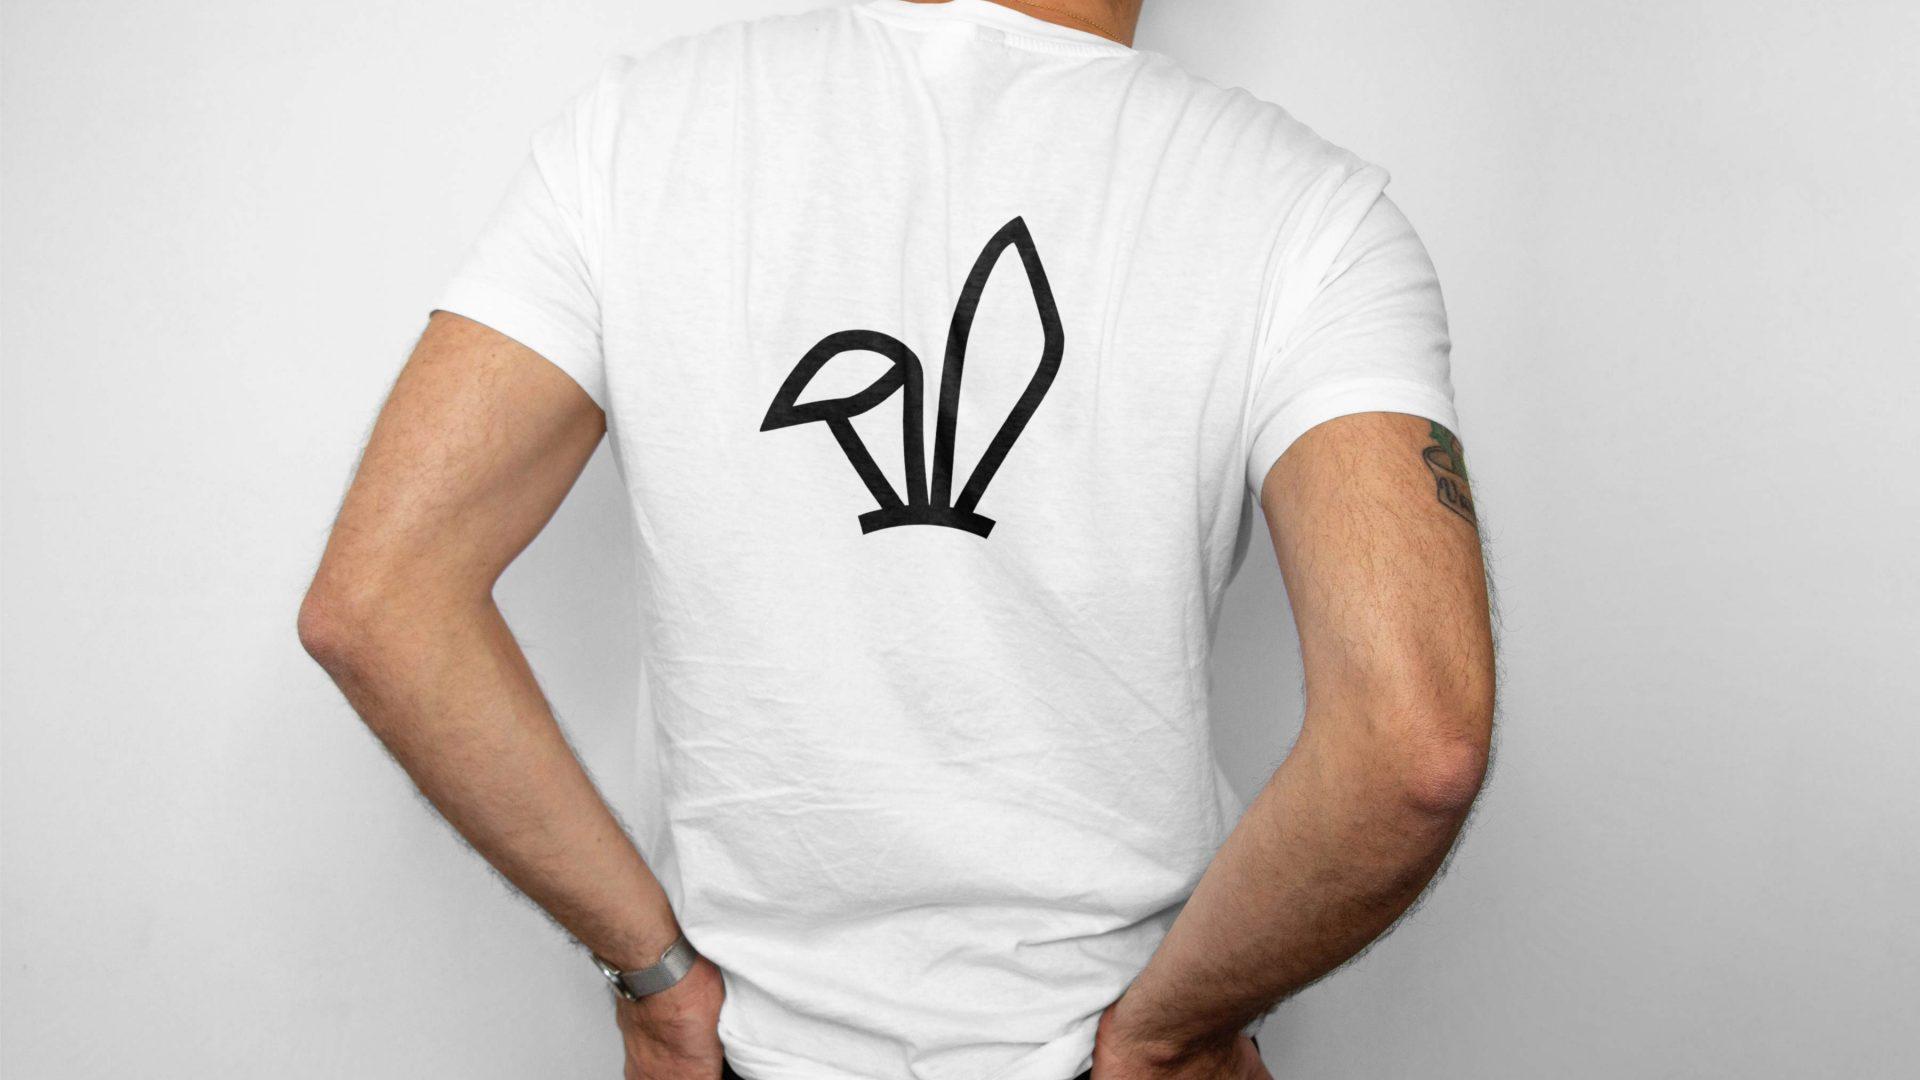 Crate47 Branding forThe Bunny bubble tea shop – black bunny ears design on back of white T-shirt